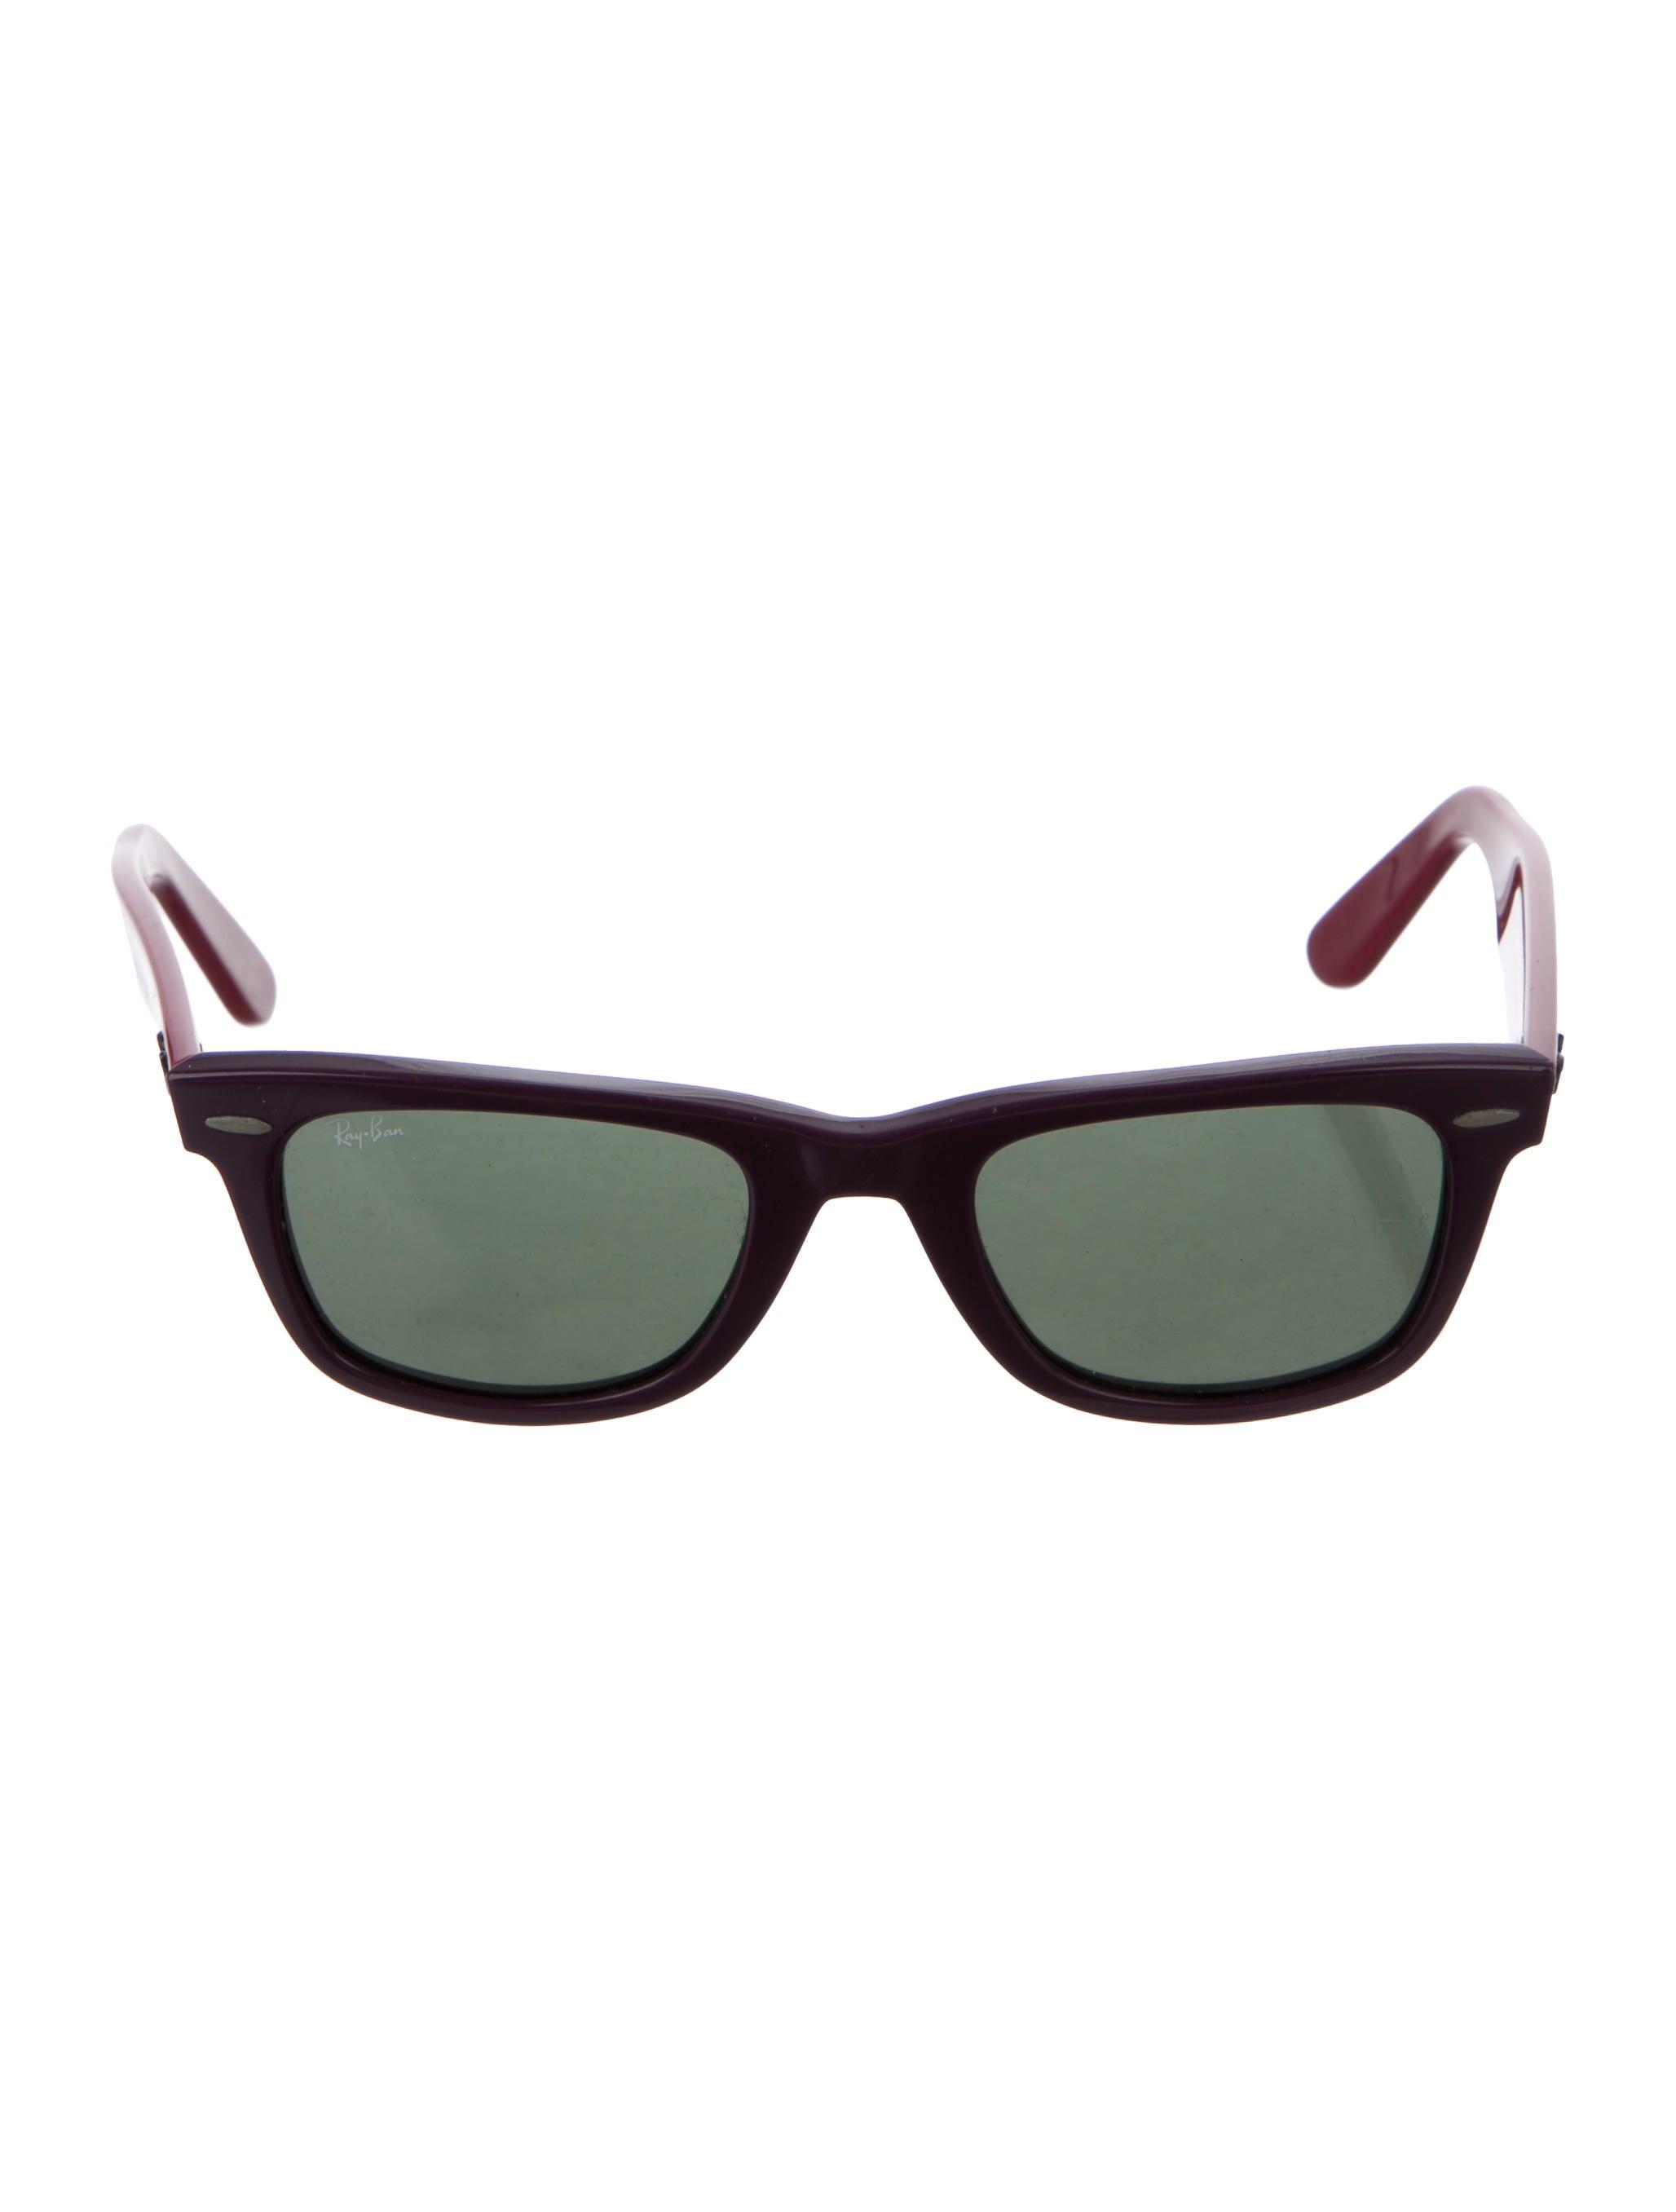 fb5f46320cae Ray-Ban Wayfarer Tinted Sunglasses - Accessories - WRX30761